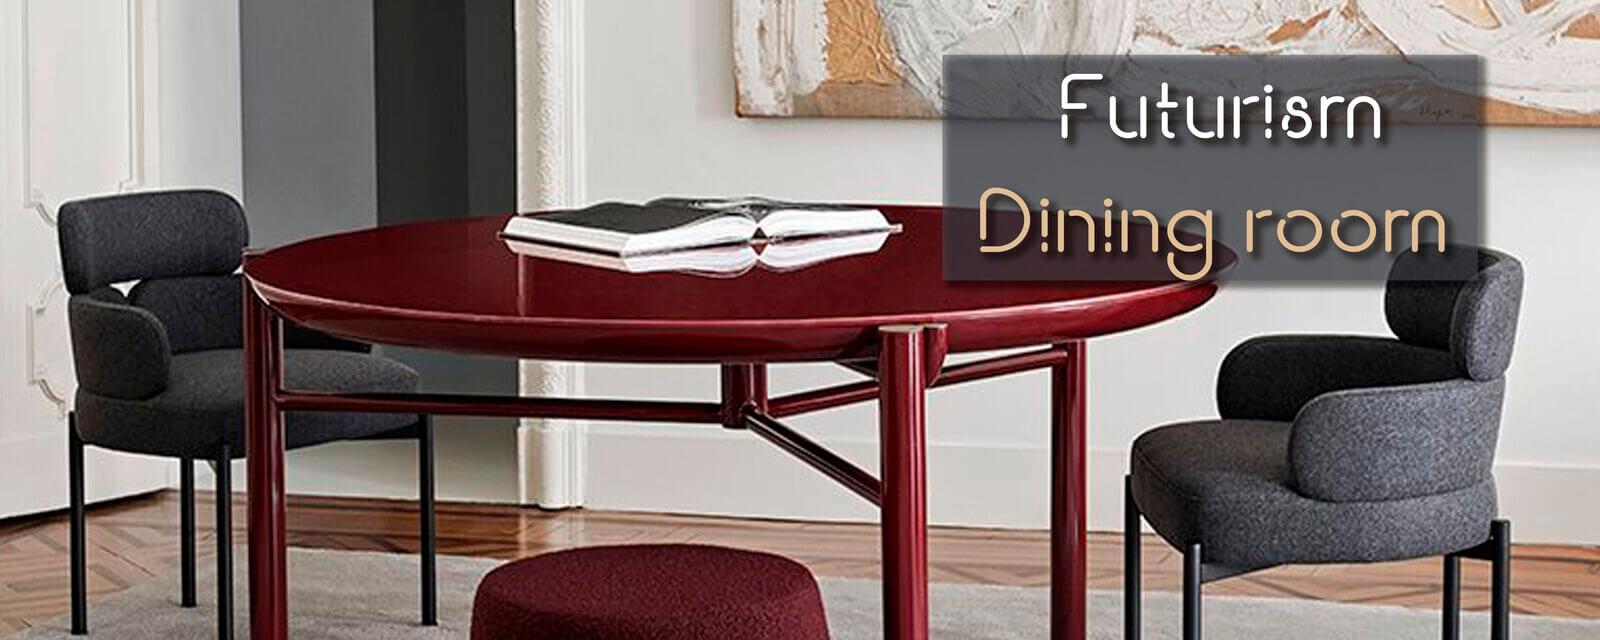 Futurism | Dining Room